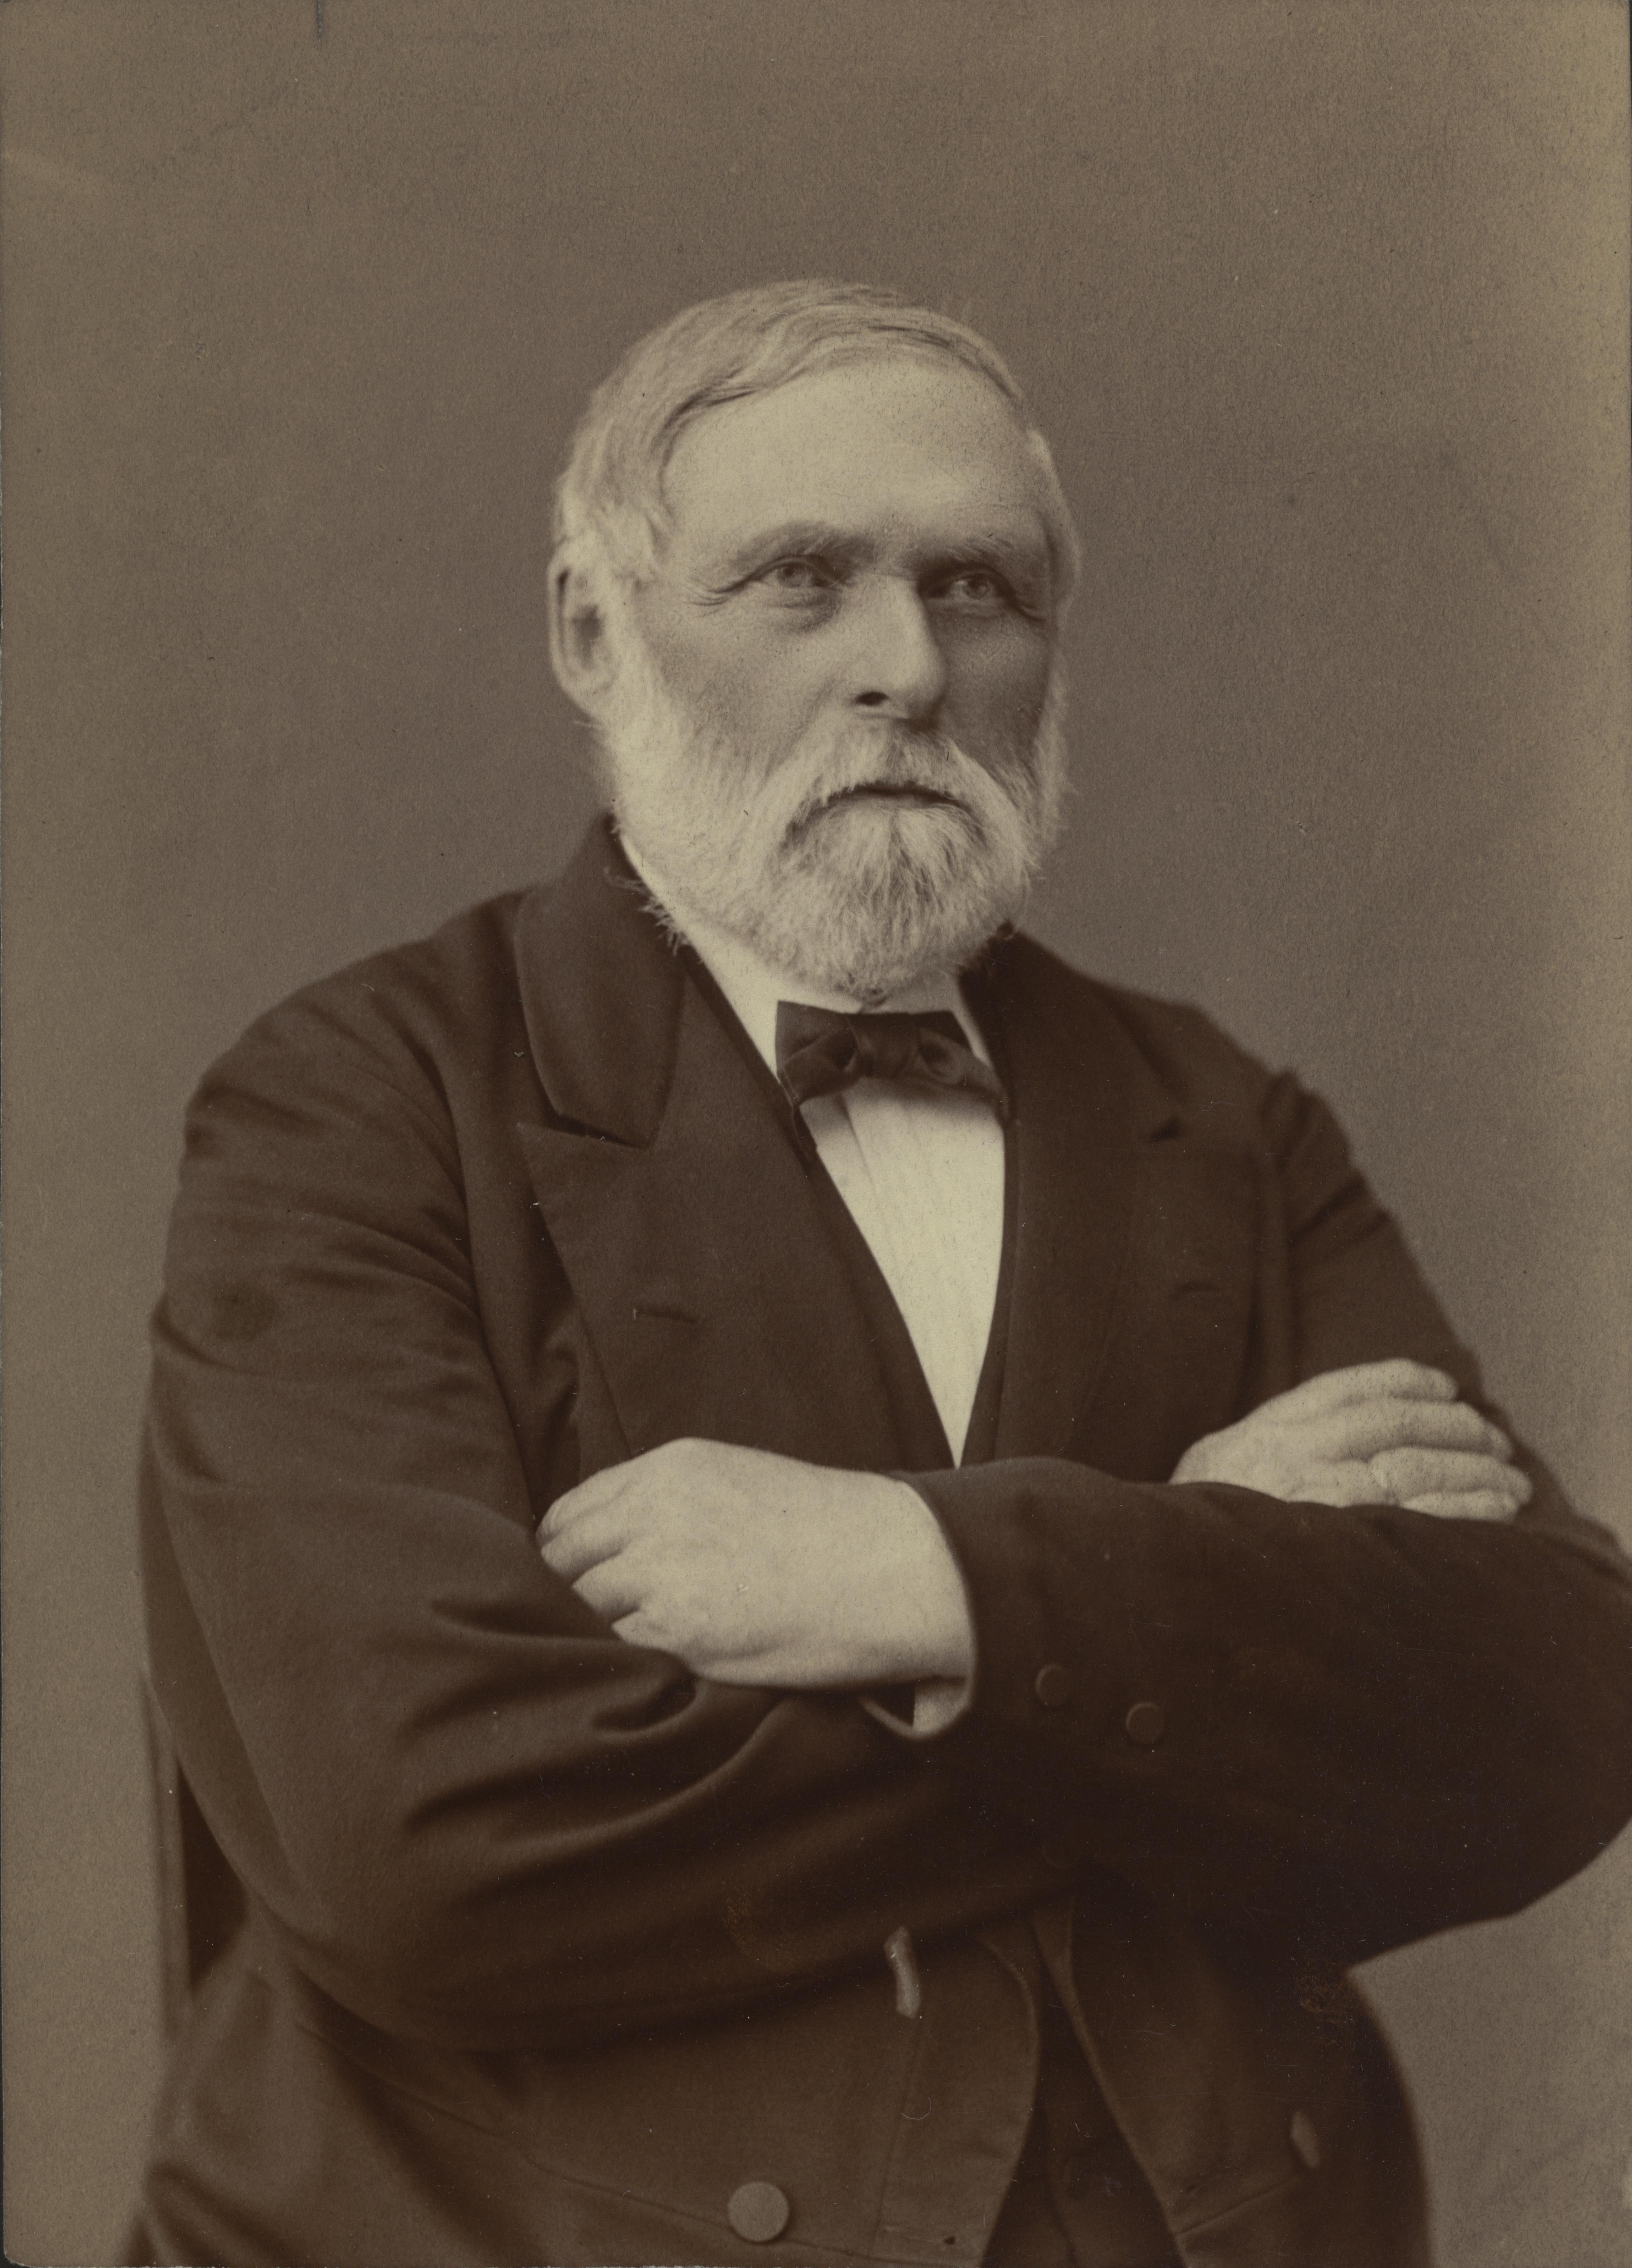 Image of Erik Olsen from Wikidata